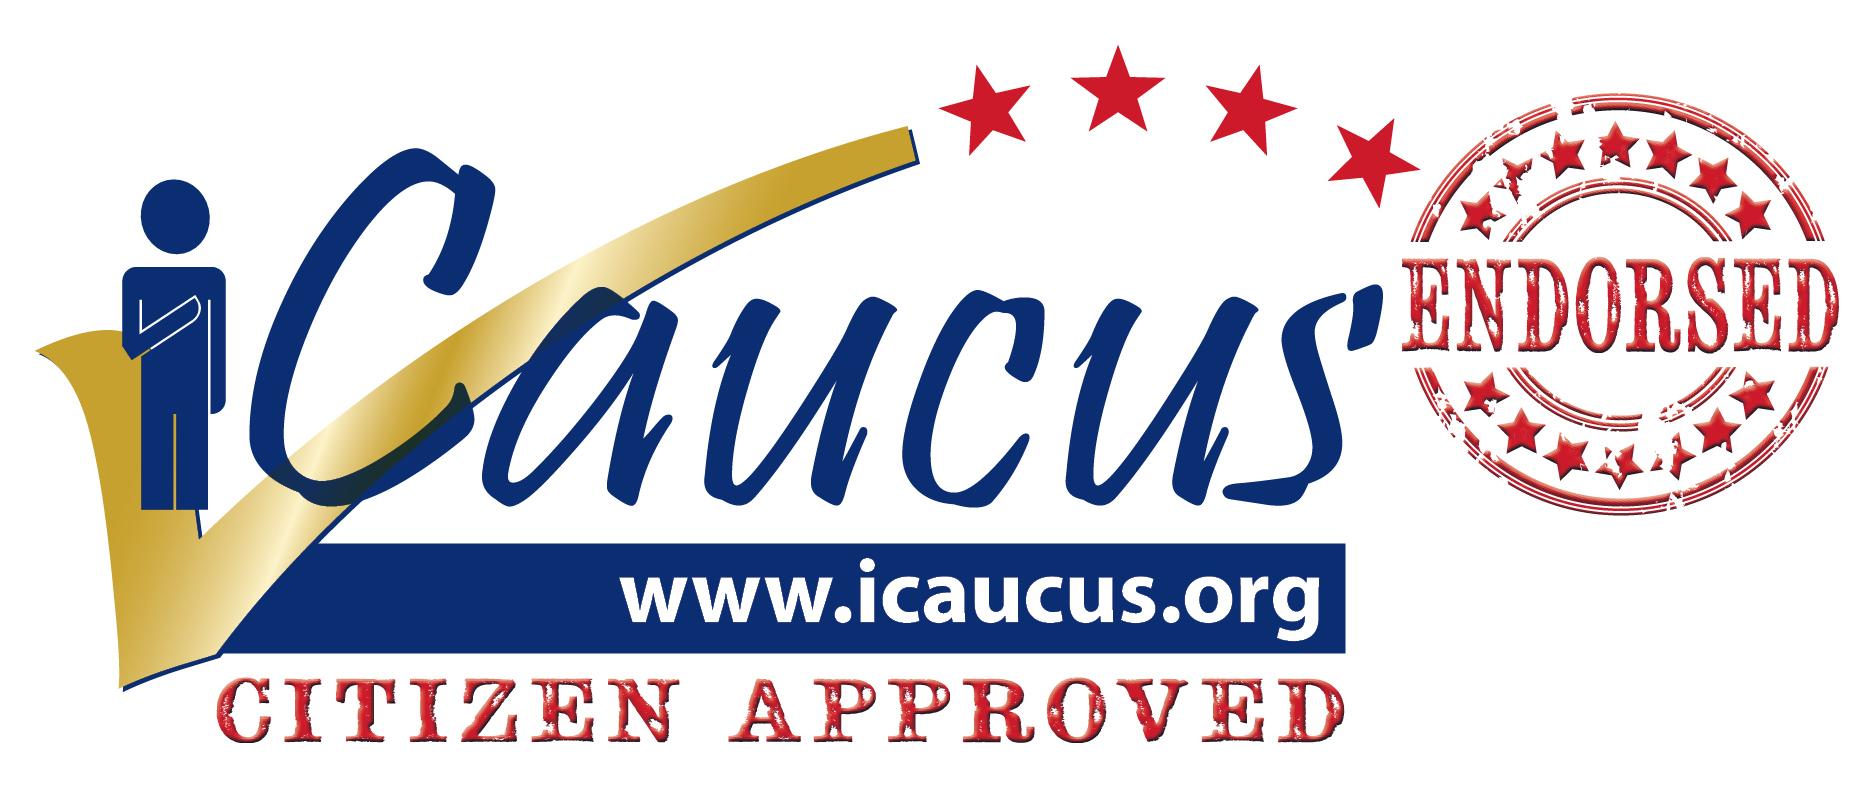 iCaucus_logo.jpg